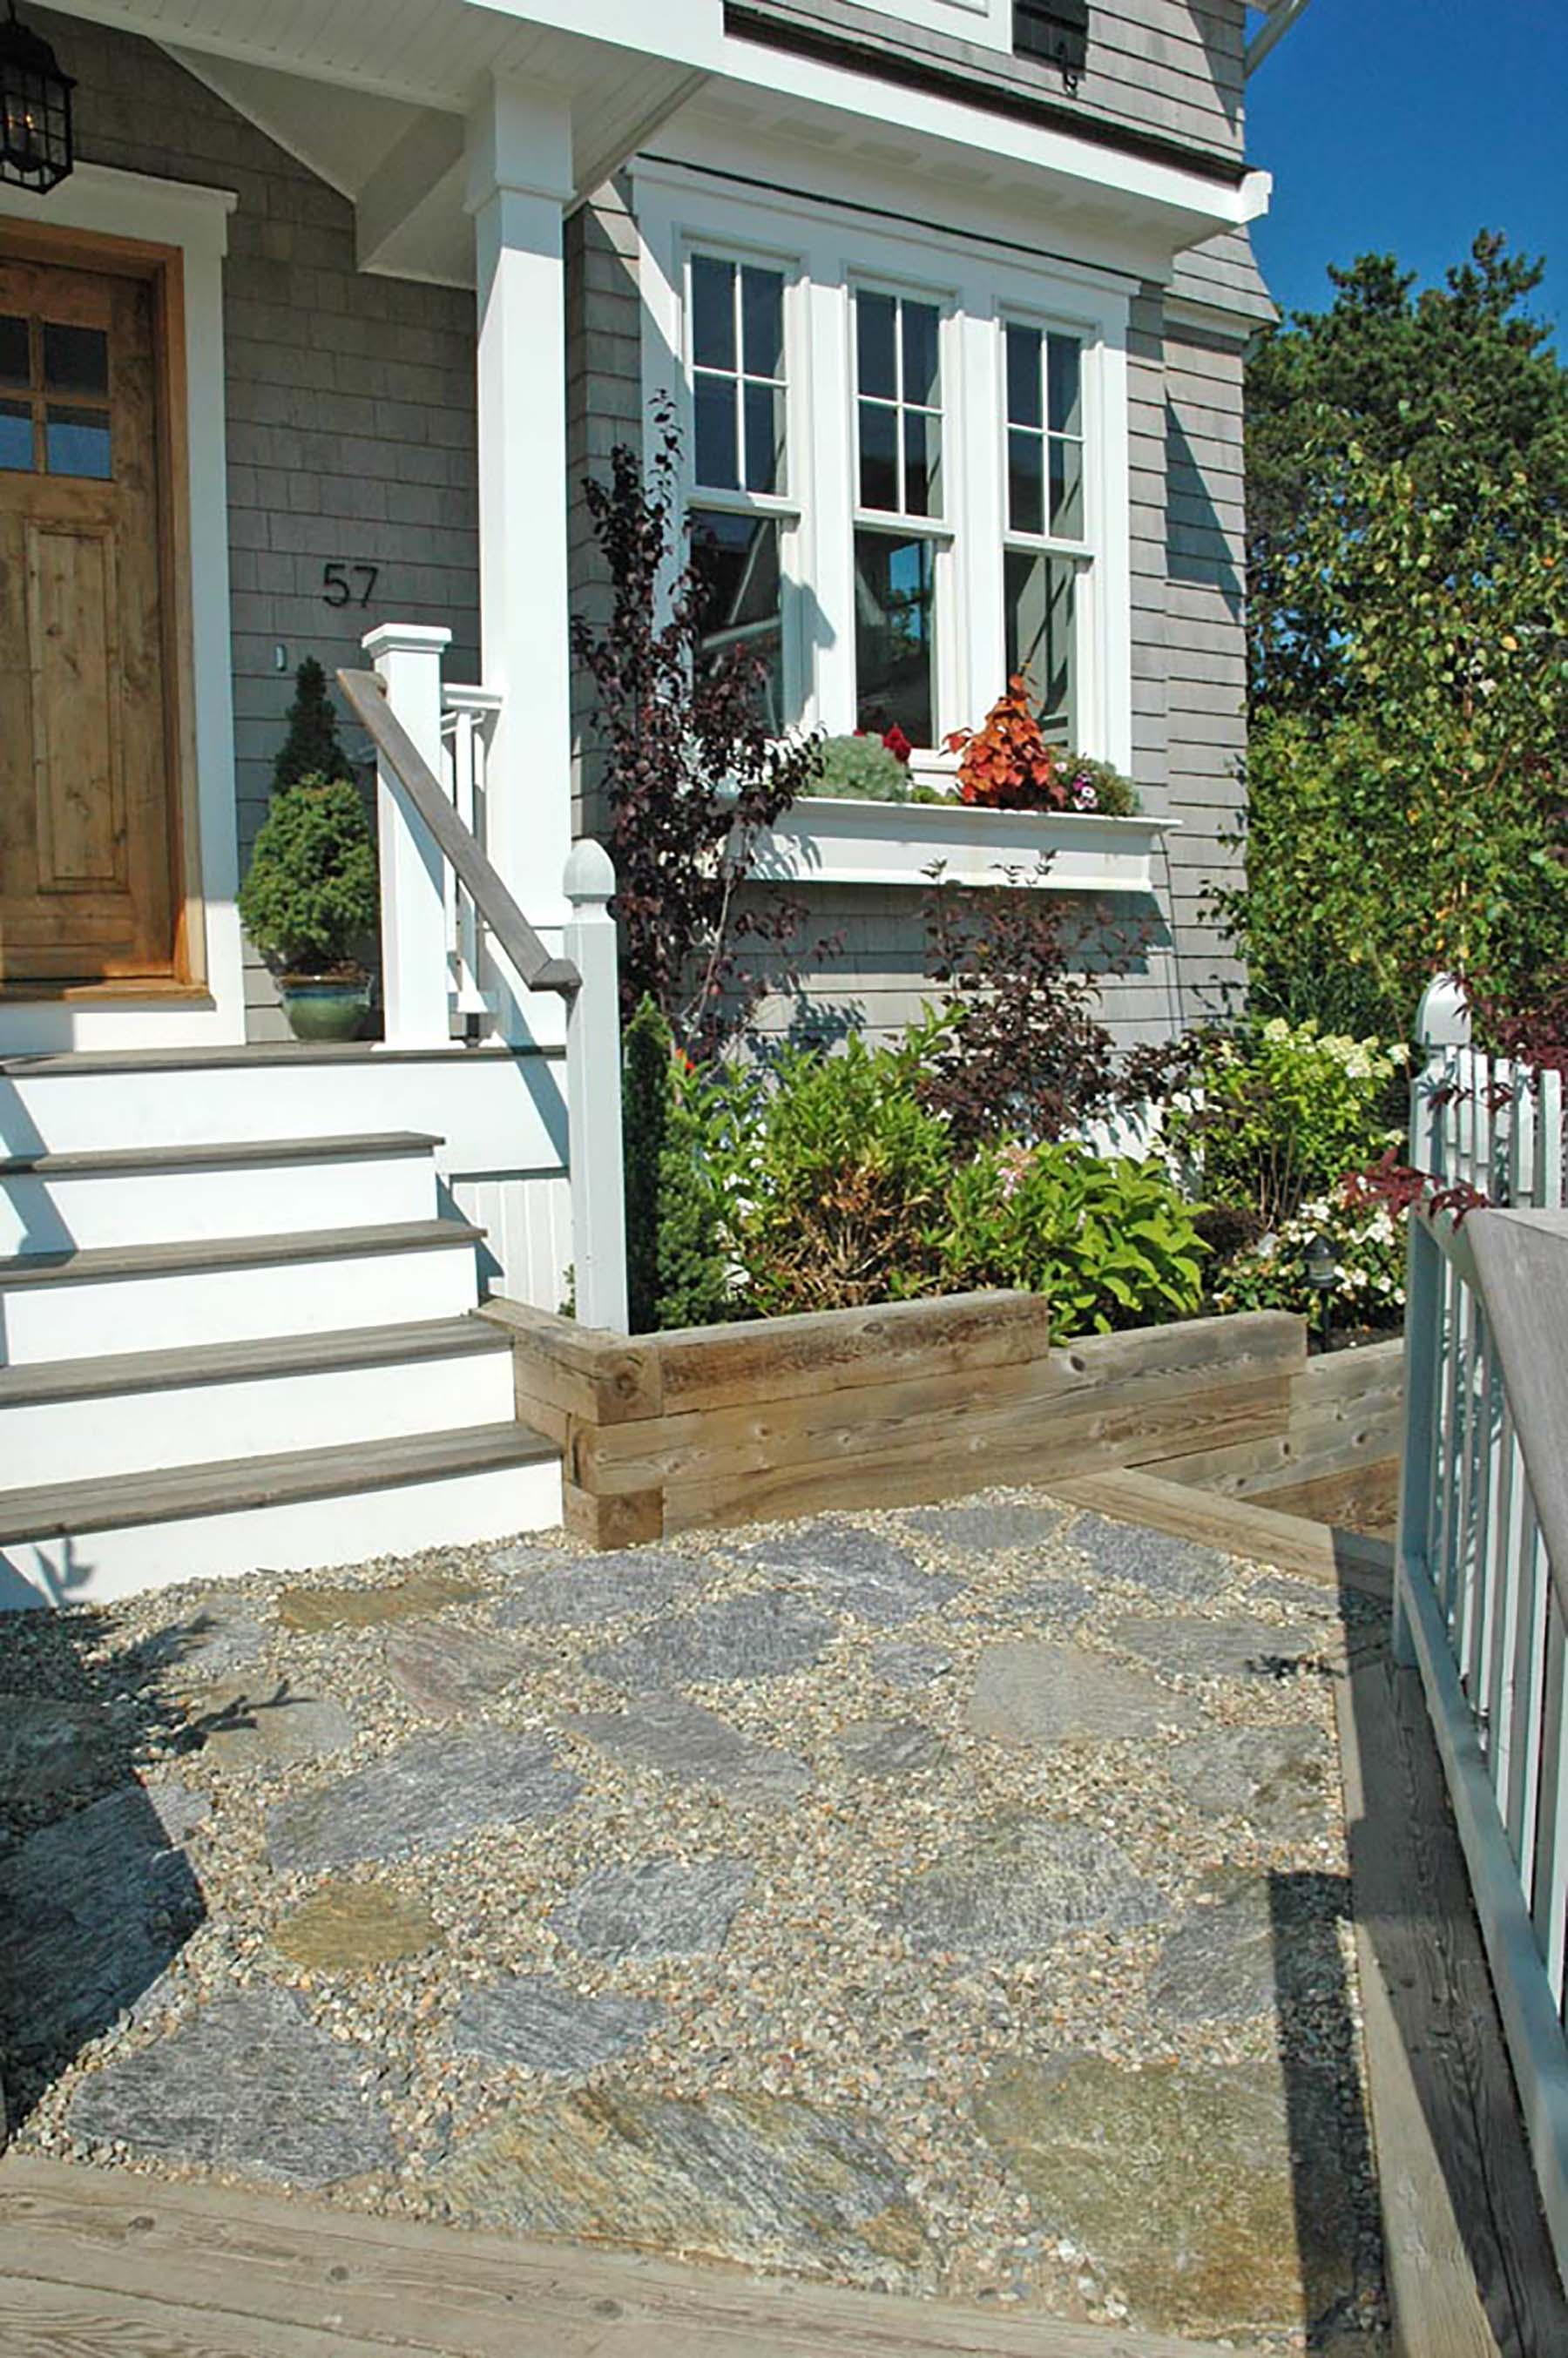 Ticonderoga Granite Flagging outside residential home